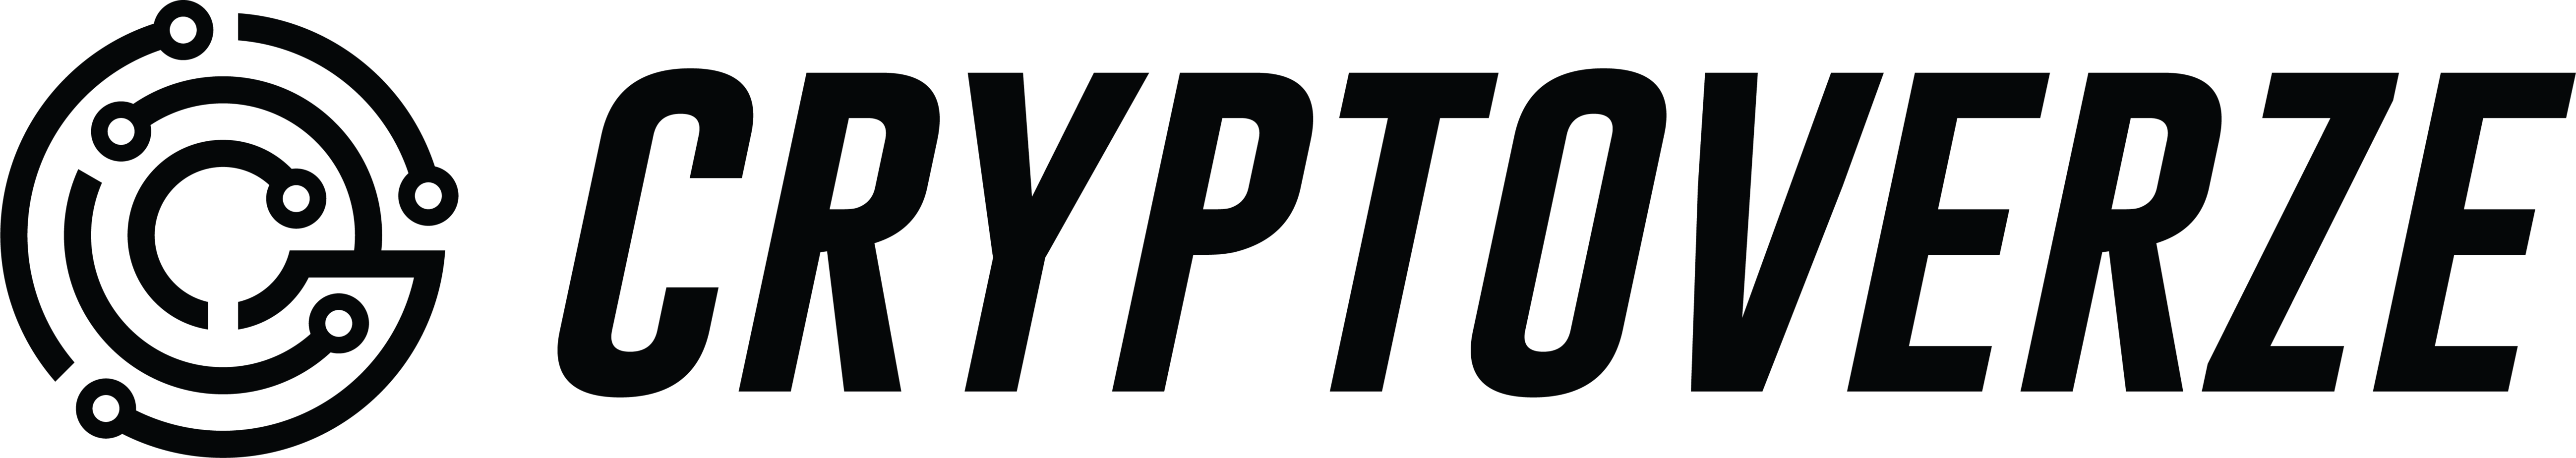 Cryptoverze